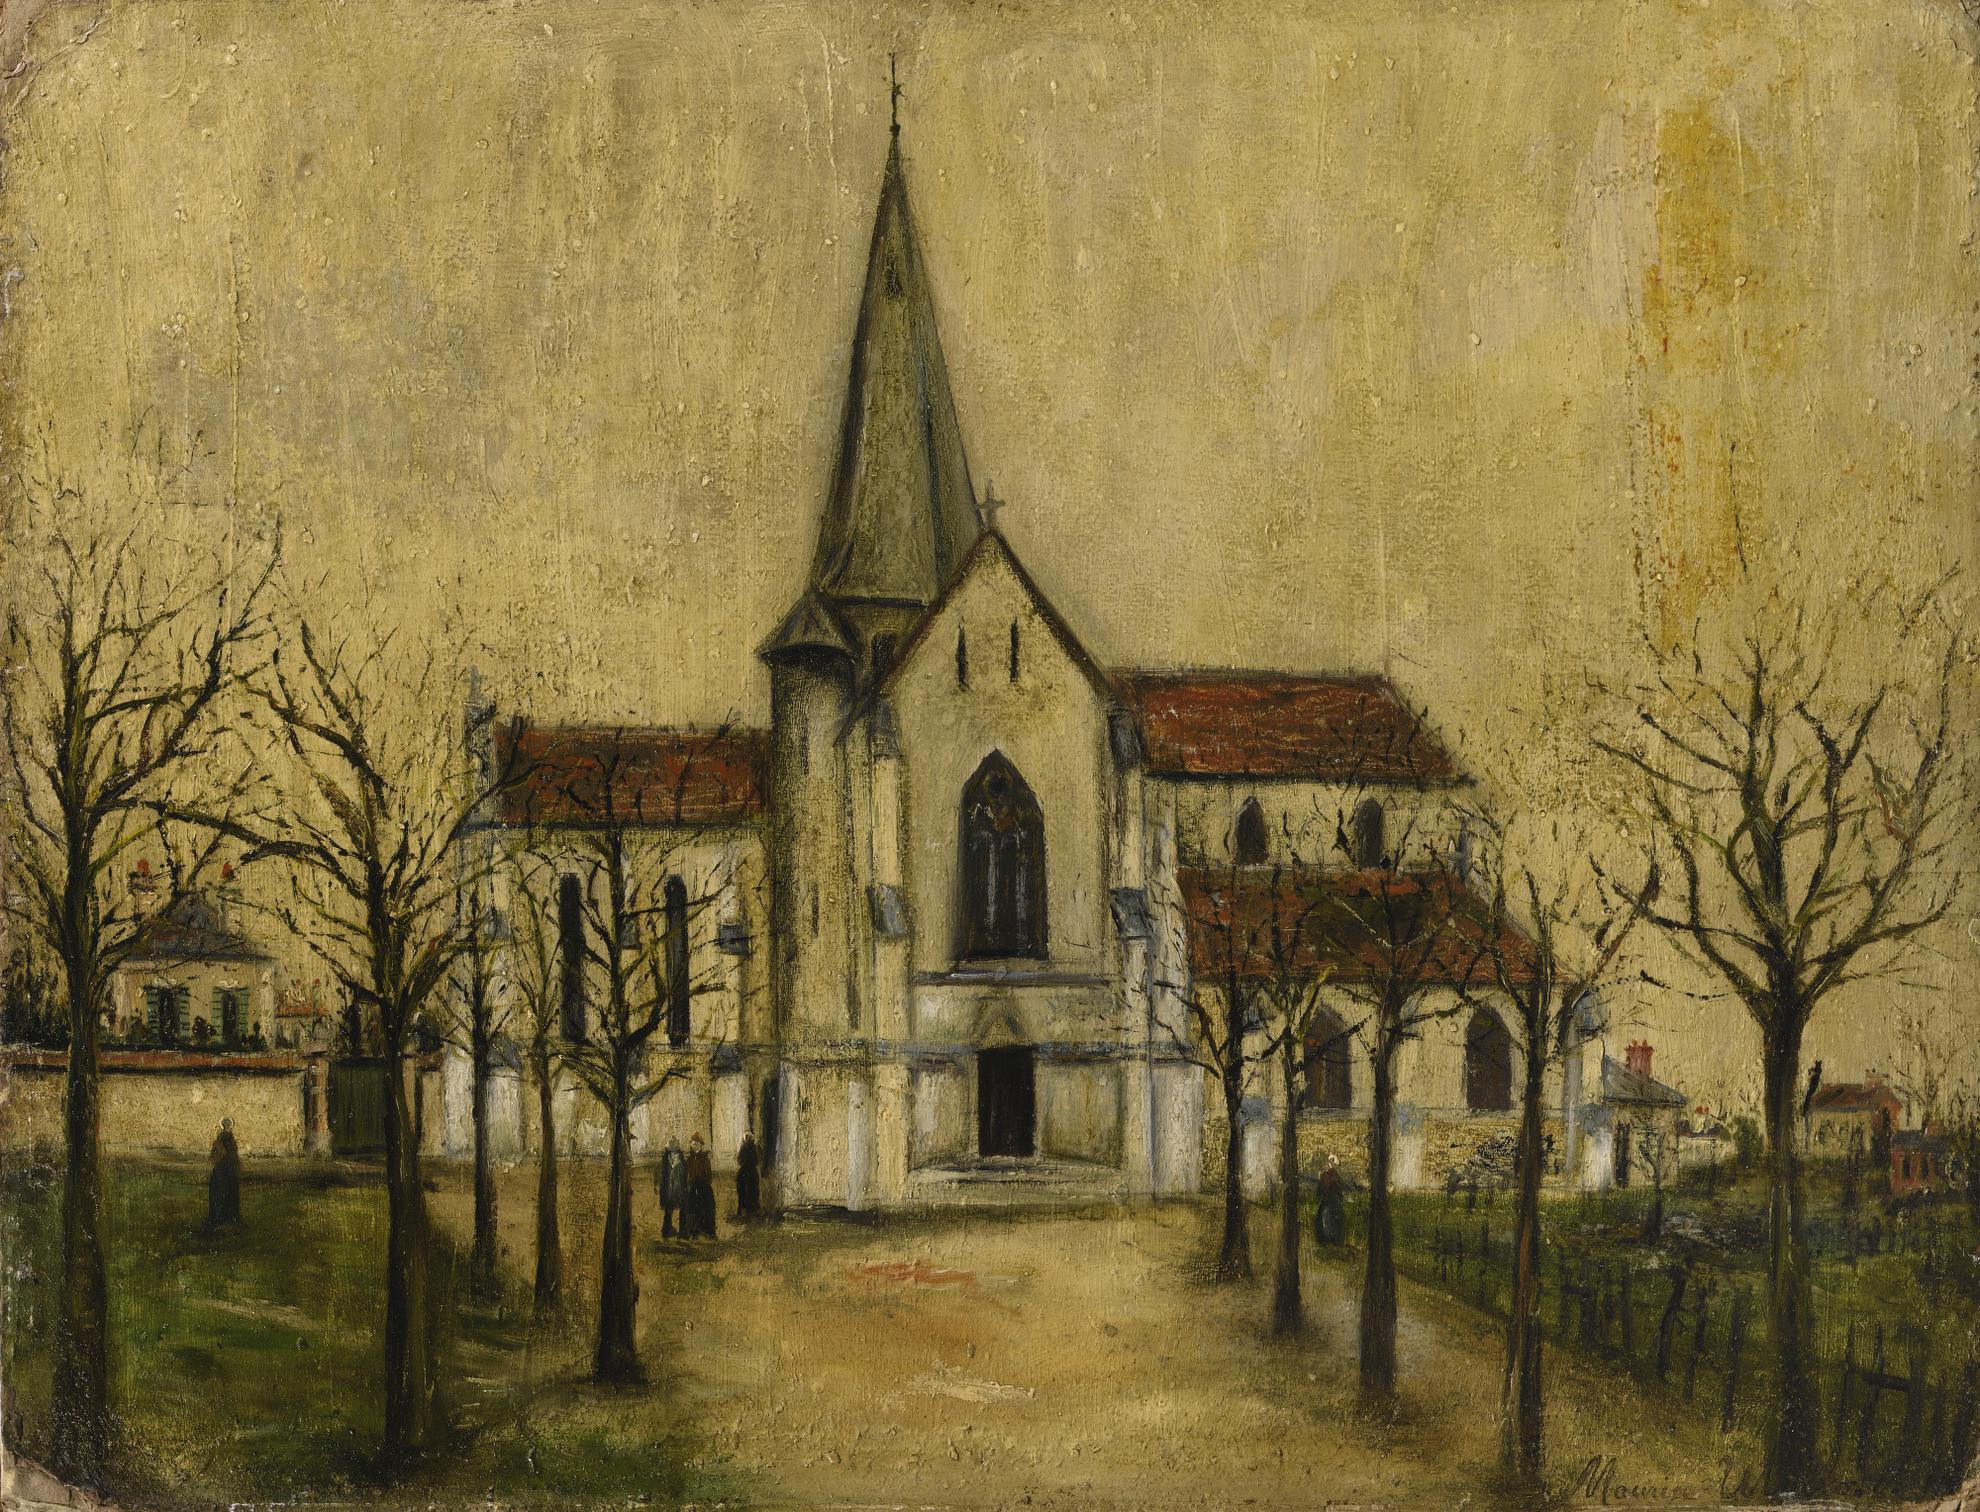 Maurice Utrillo-Leglise-1916